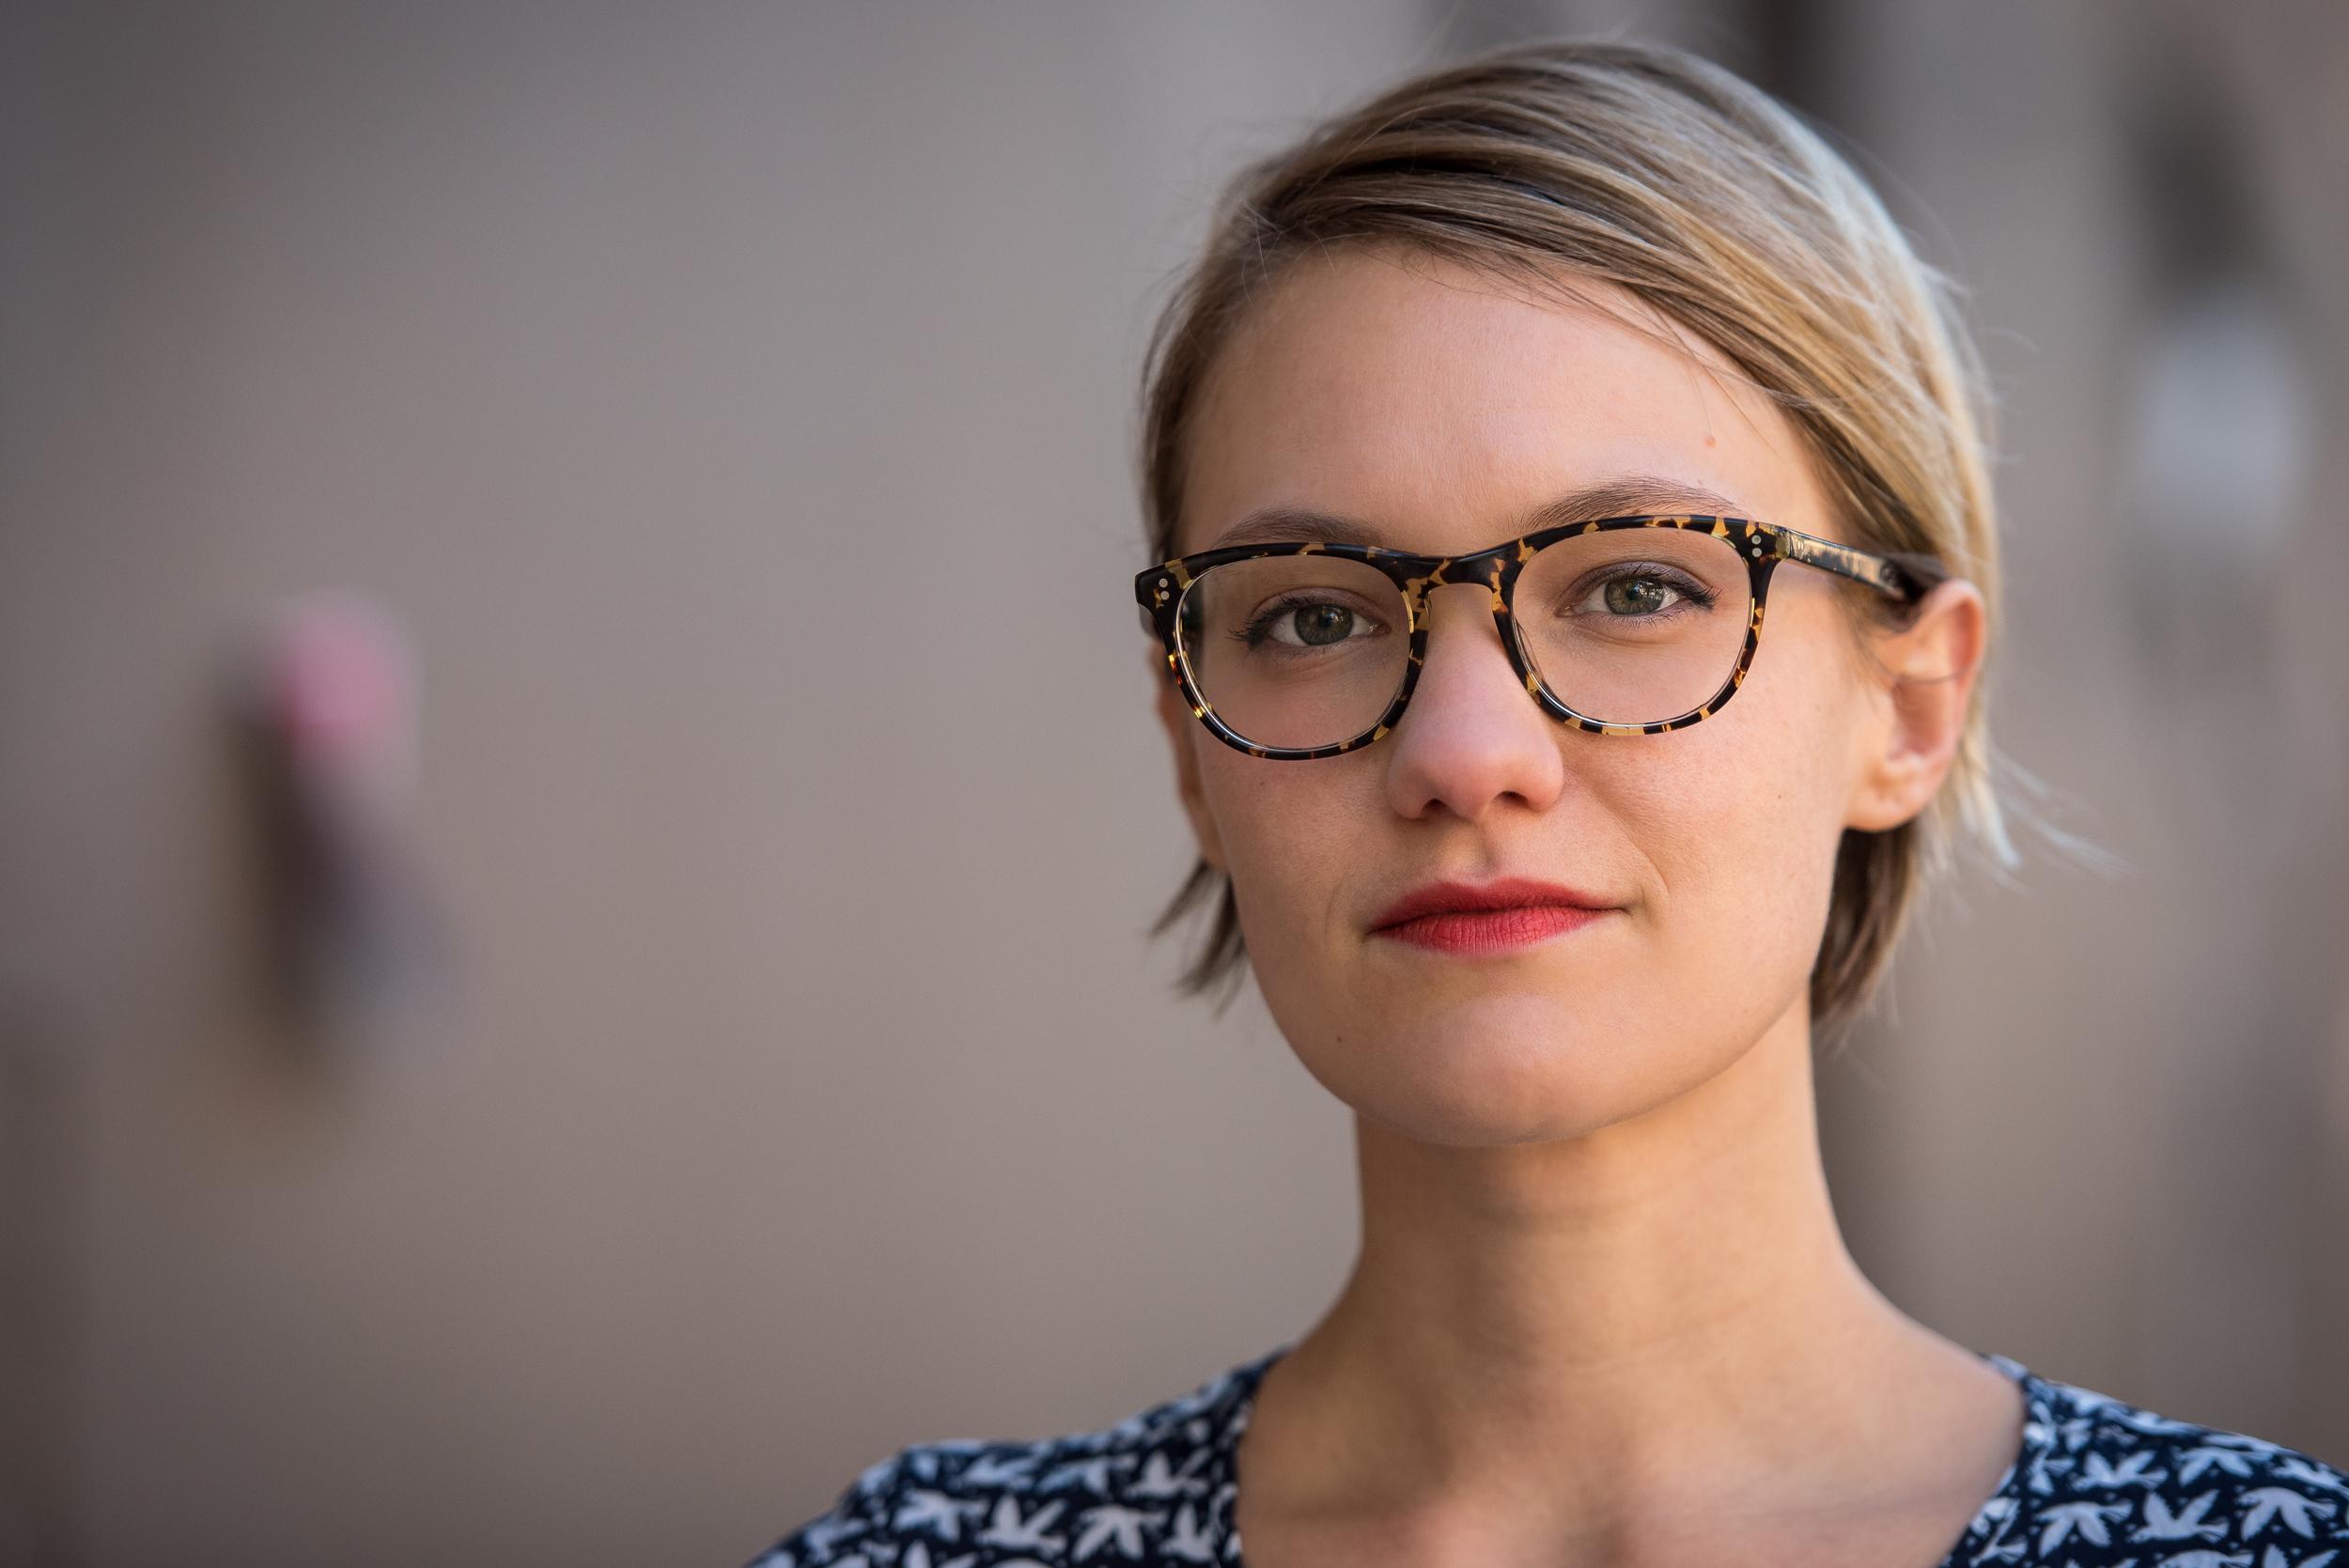 Laura Fallsgraff, Co-Producer